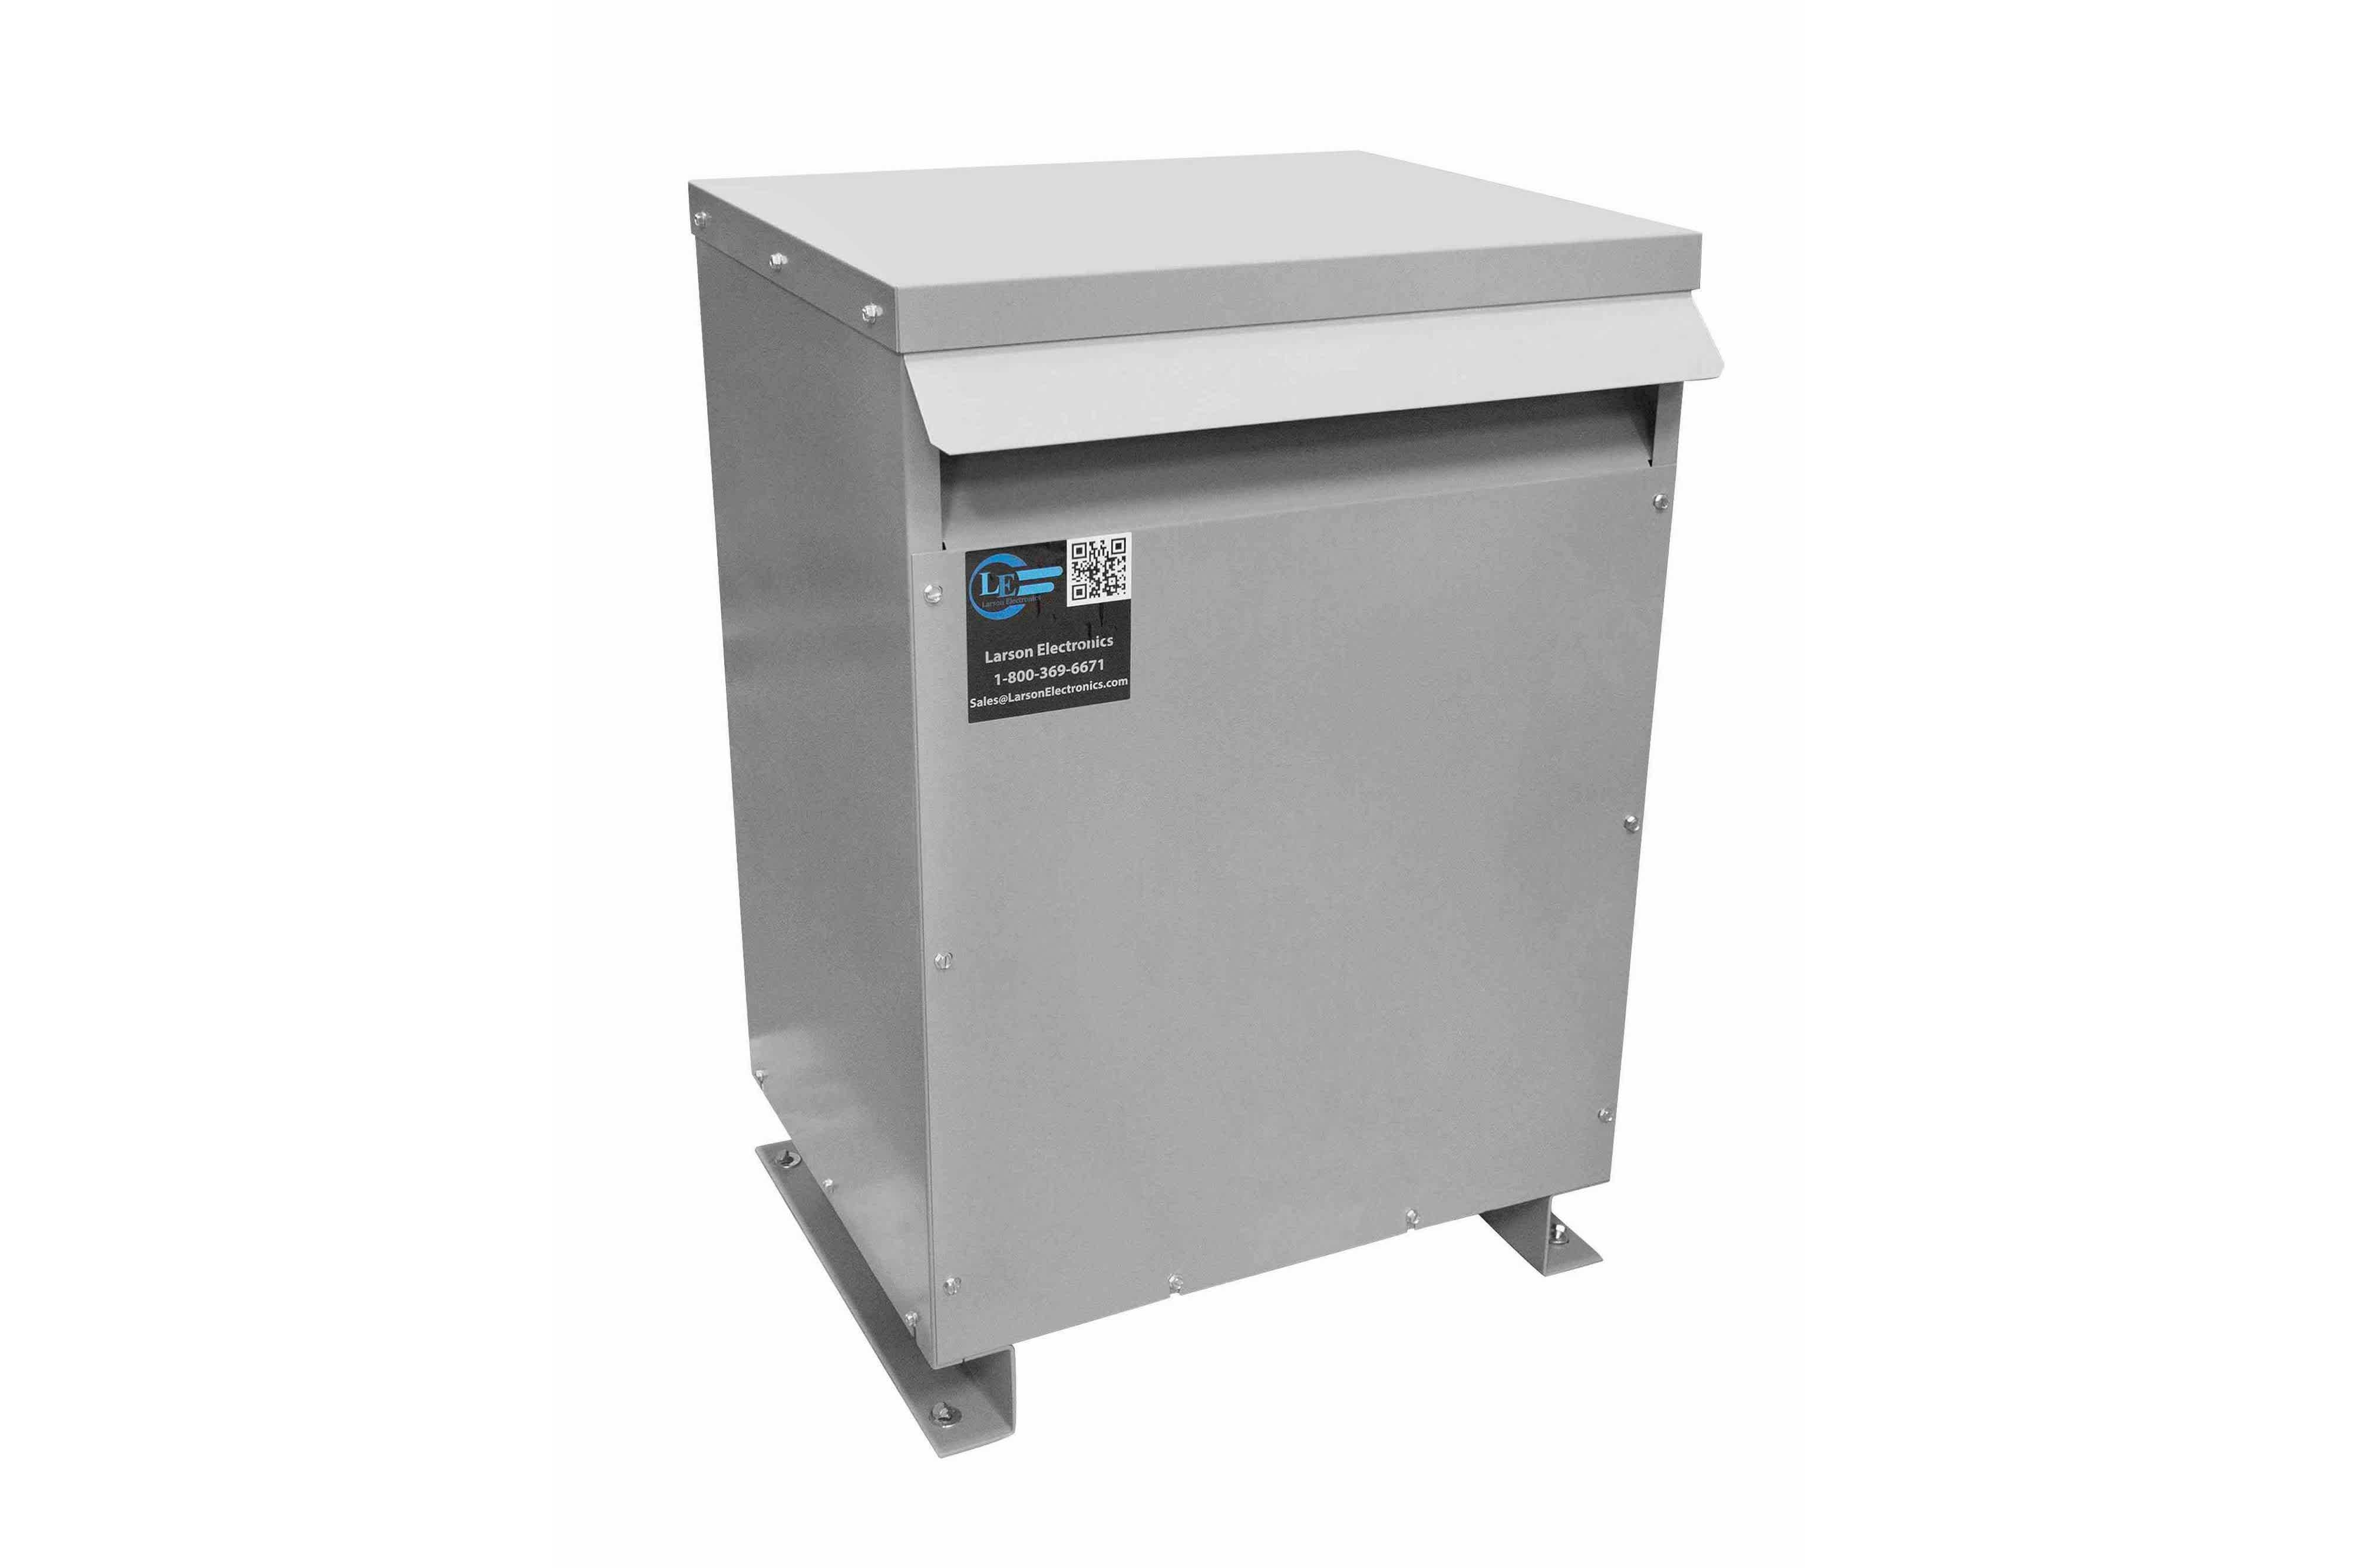 50 kVA 3PH Isolation Transformer, 600V Wye Primary, 380V Delta Secondary, N3R, Ventilated, 60 Hz